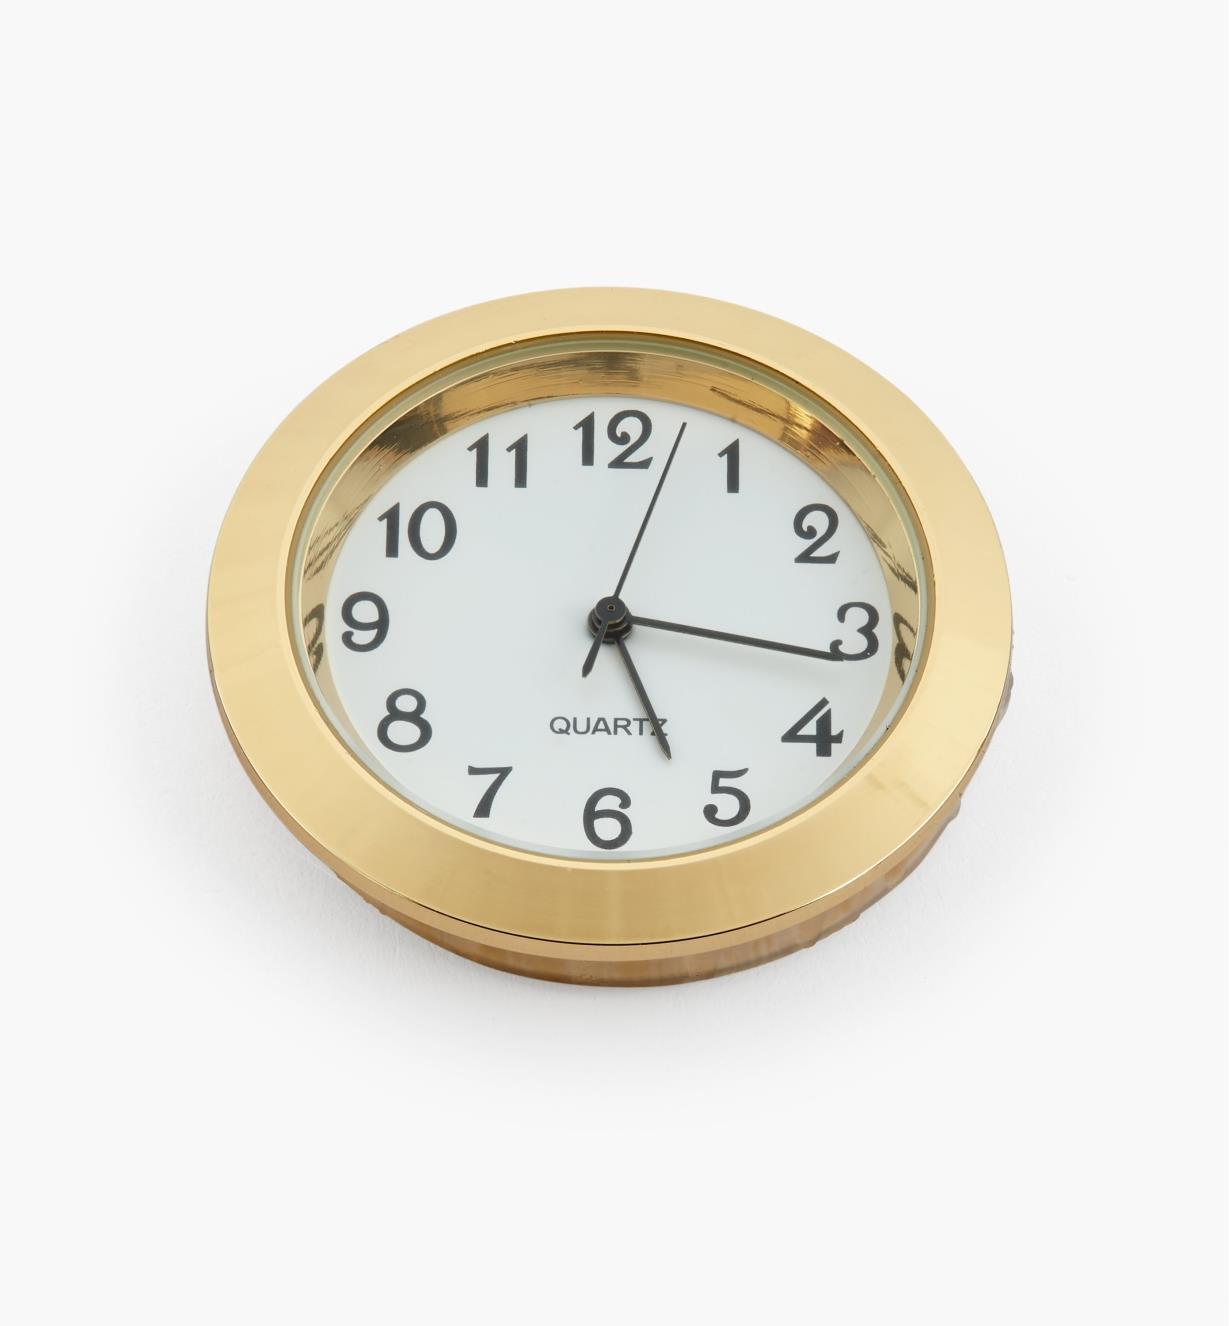 44K0150 - Horloge, cadran blanc à chiffres arabes, lunette or